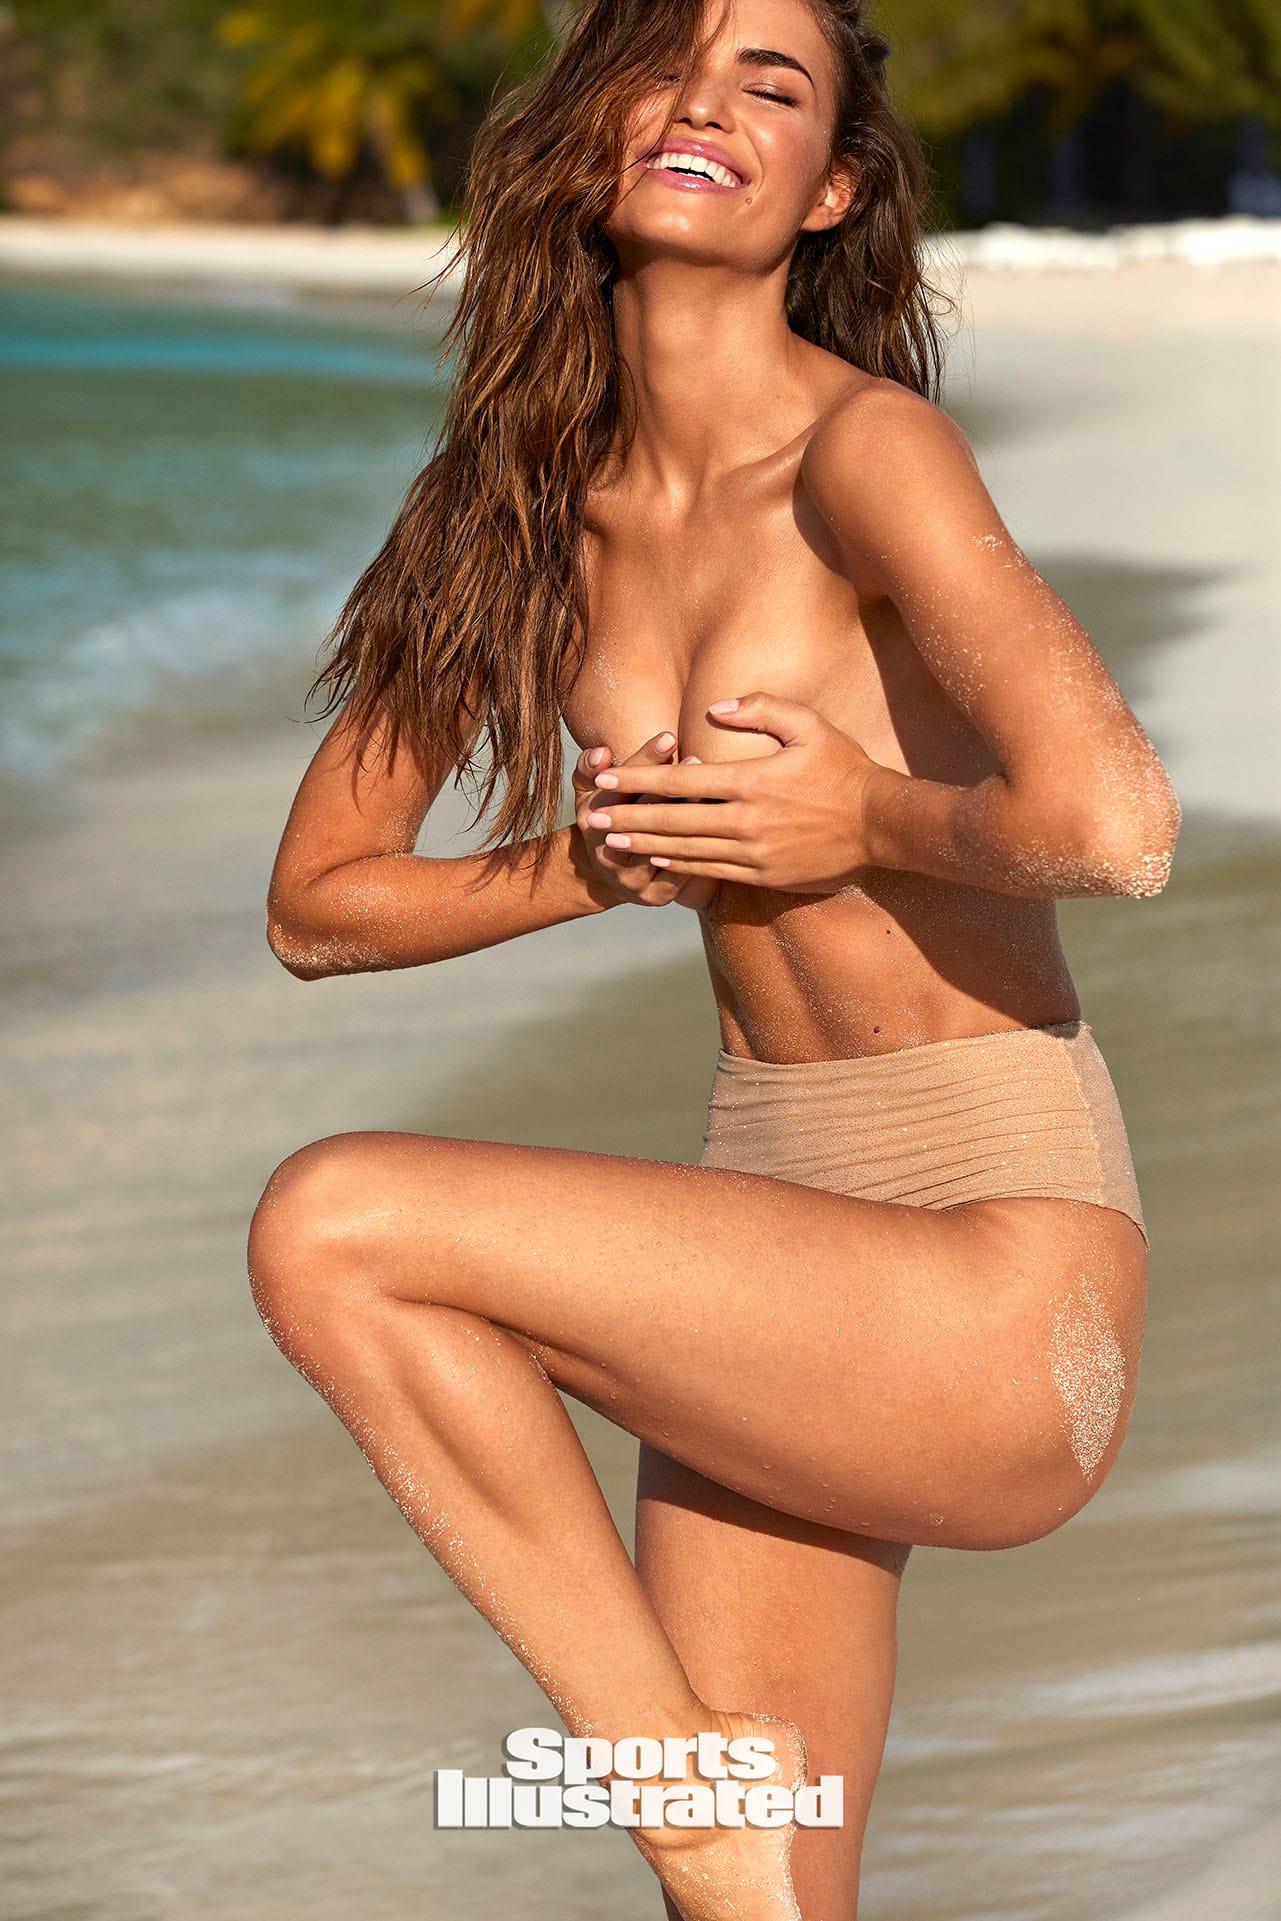 Робин Хольцкен в каталоге купальников Sports Illustrated Swimsuit 2020 / фото 16